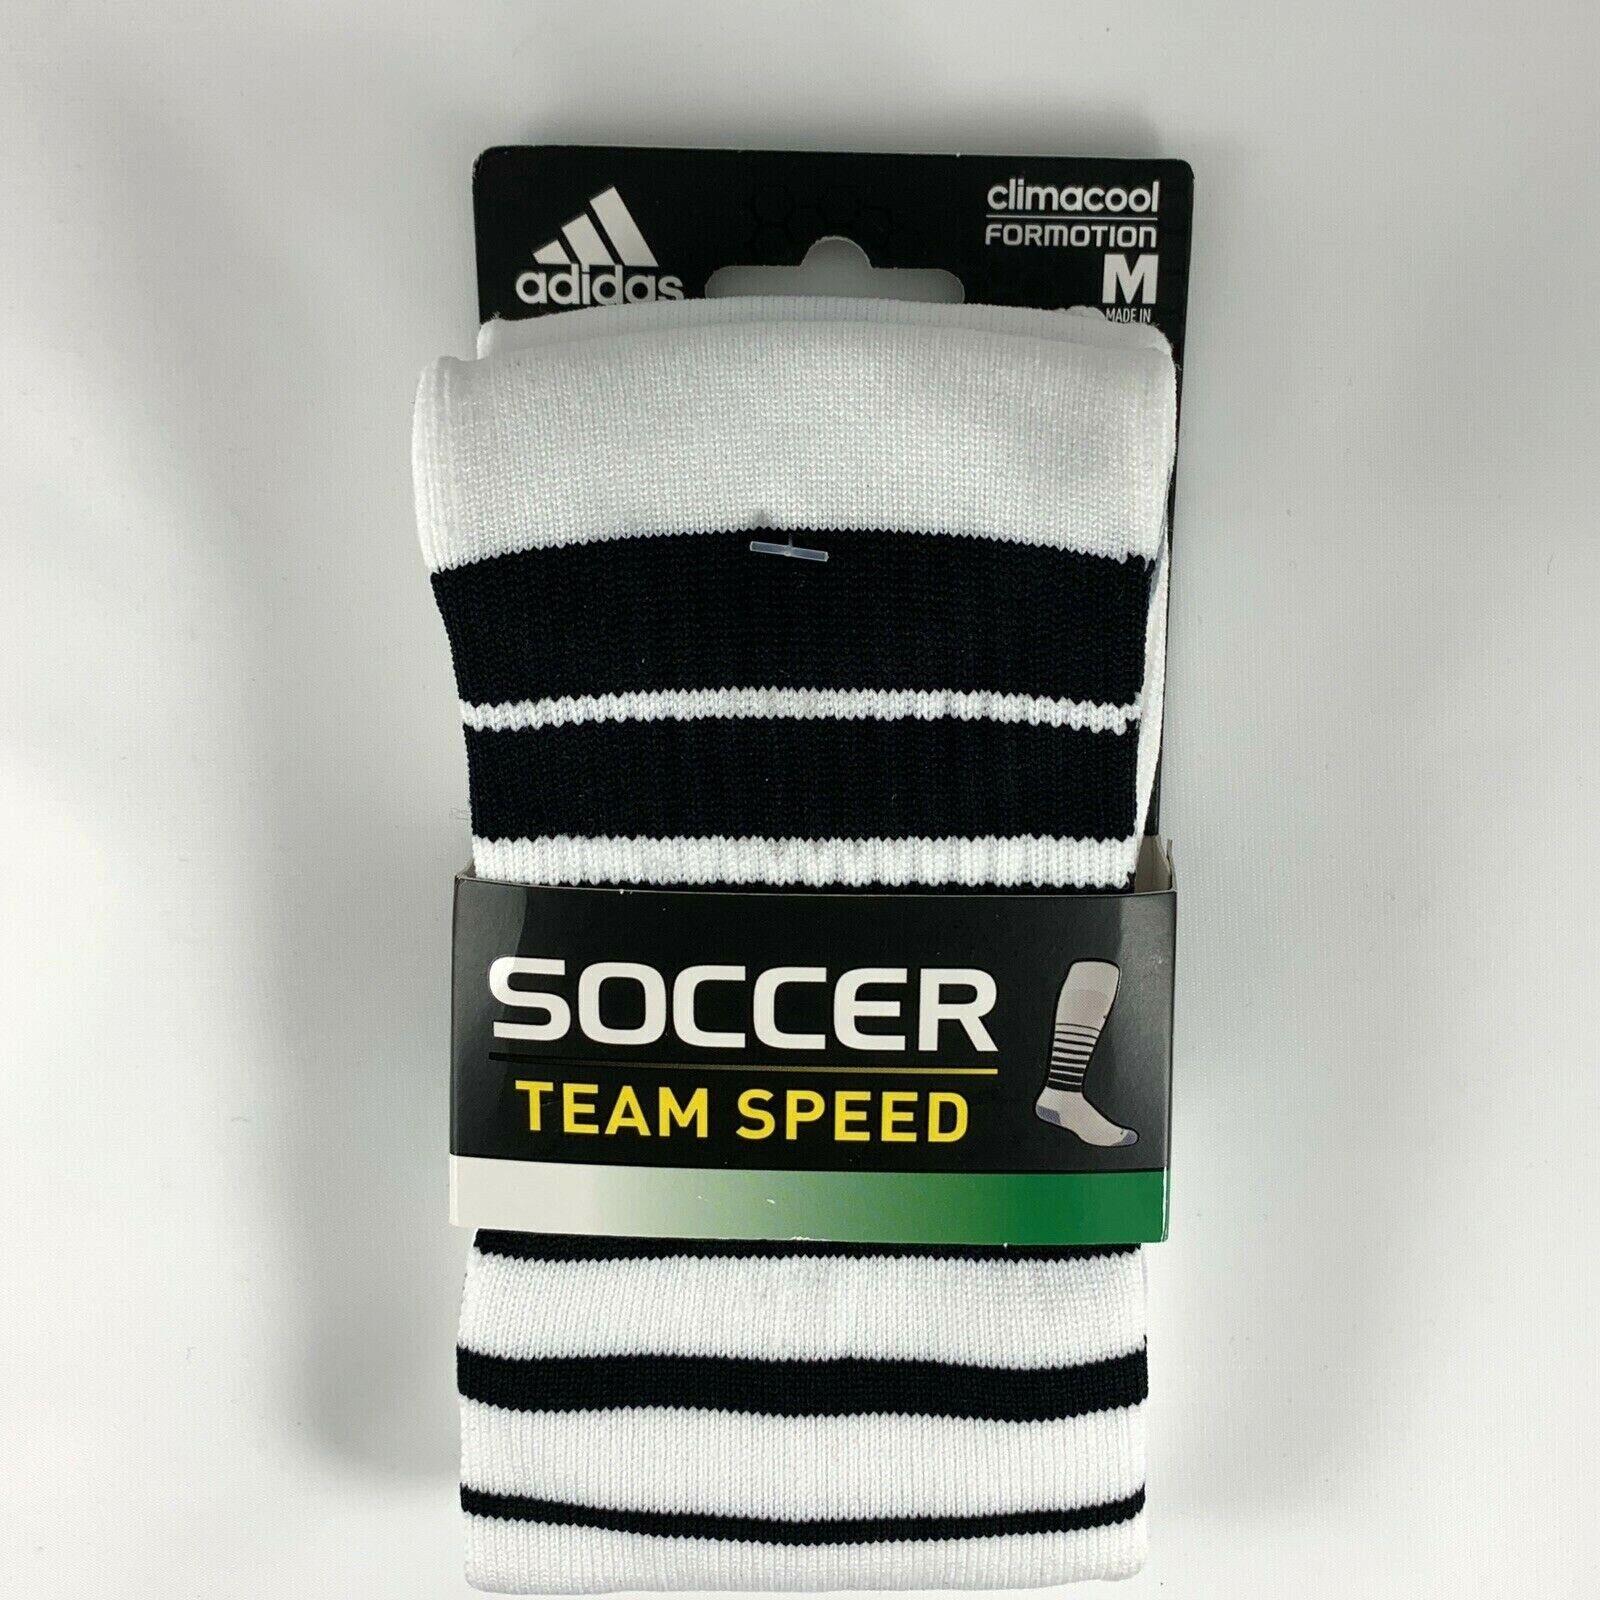 ADIDAS SOCCER Socks Climacool Unisex M Men 5-8.5 W 5-9.5 Whi